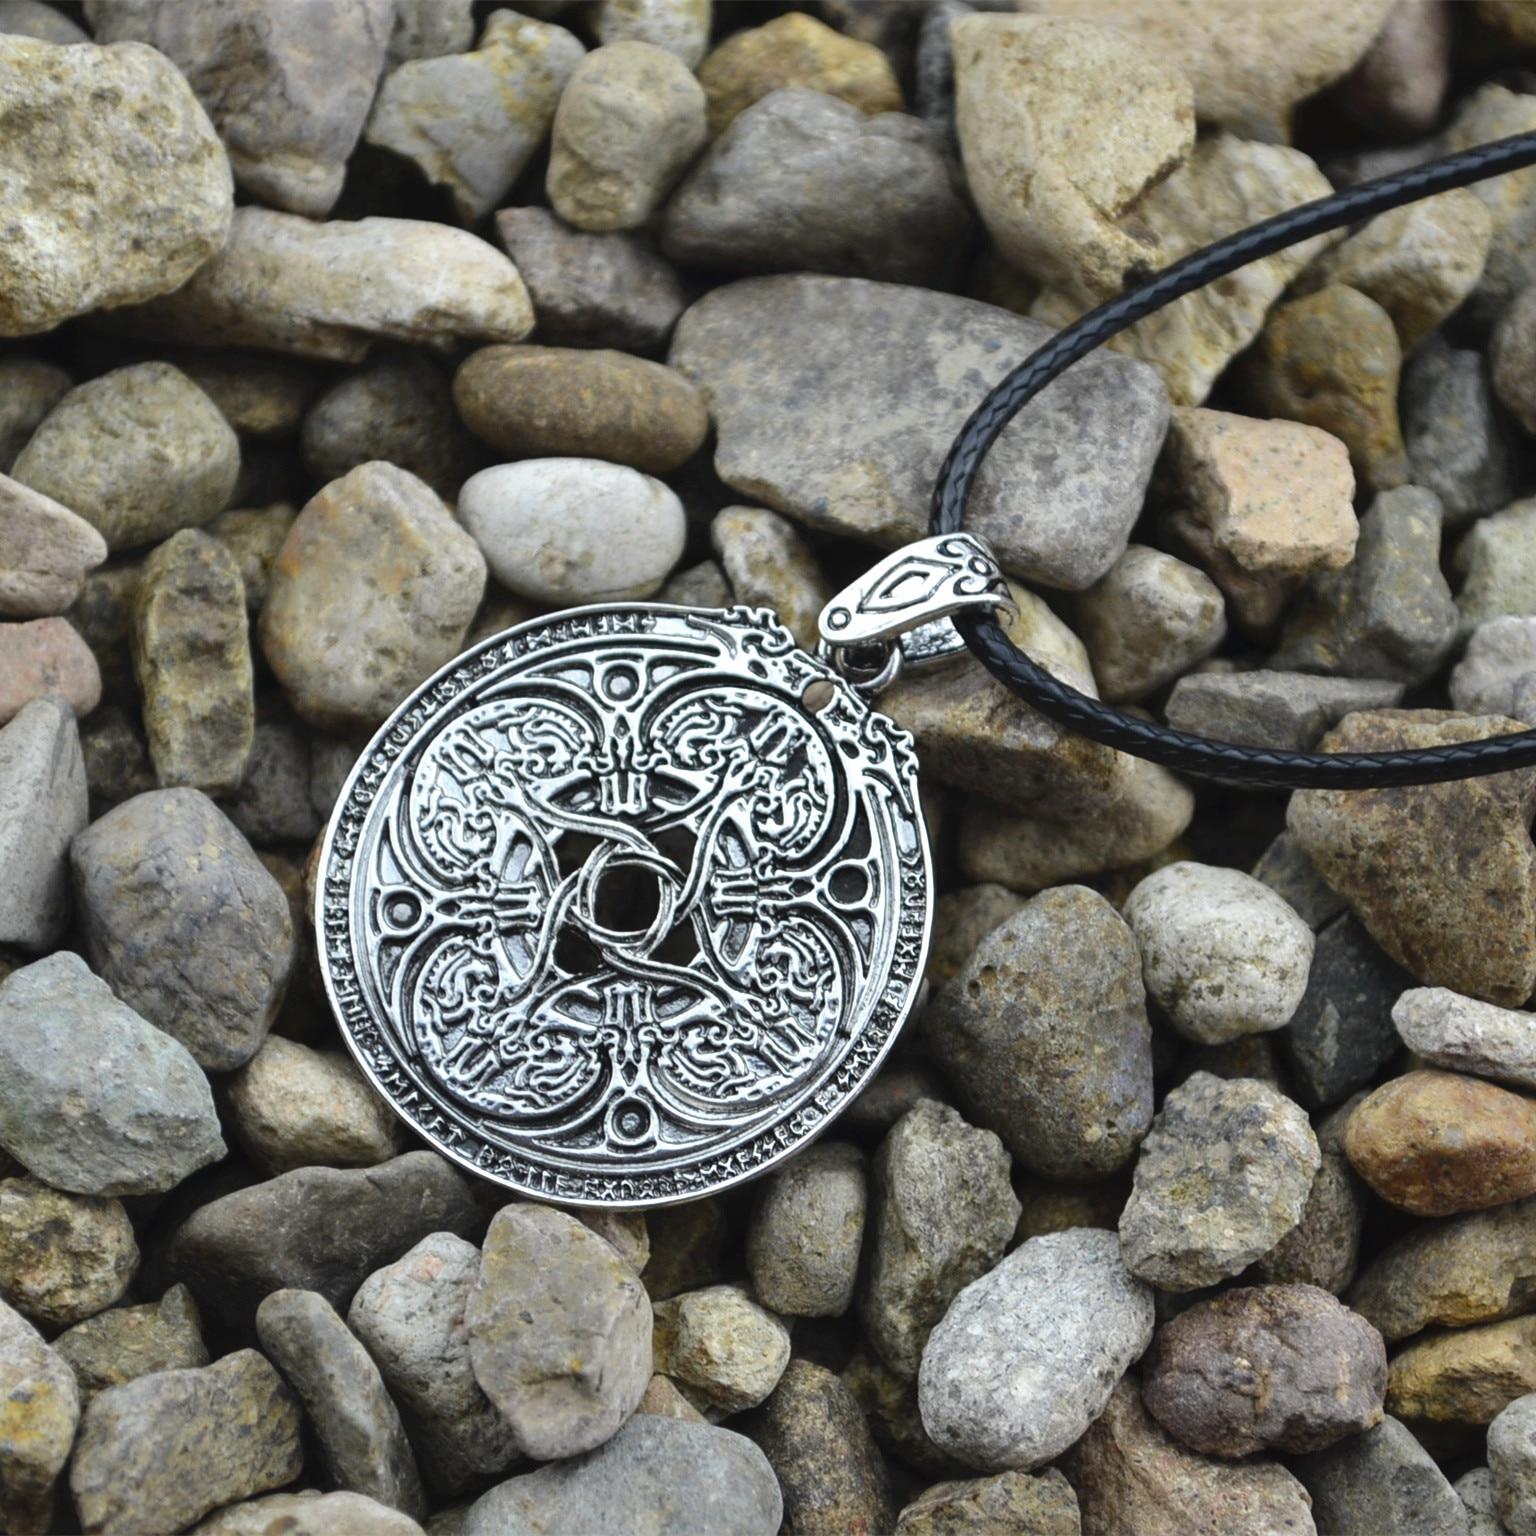 1pcs valkyrie symbol viking scandinavian amulet pendants valkyrie 1pcs valkyrie symbol viking scandinavian amulet pendants valkyrie scandinavian amulet pendants viking in pendants from jewelry accessories on mozeypictures Choice Image